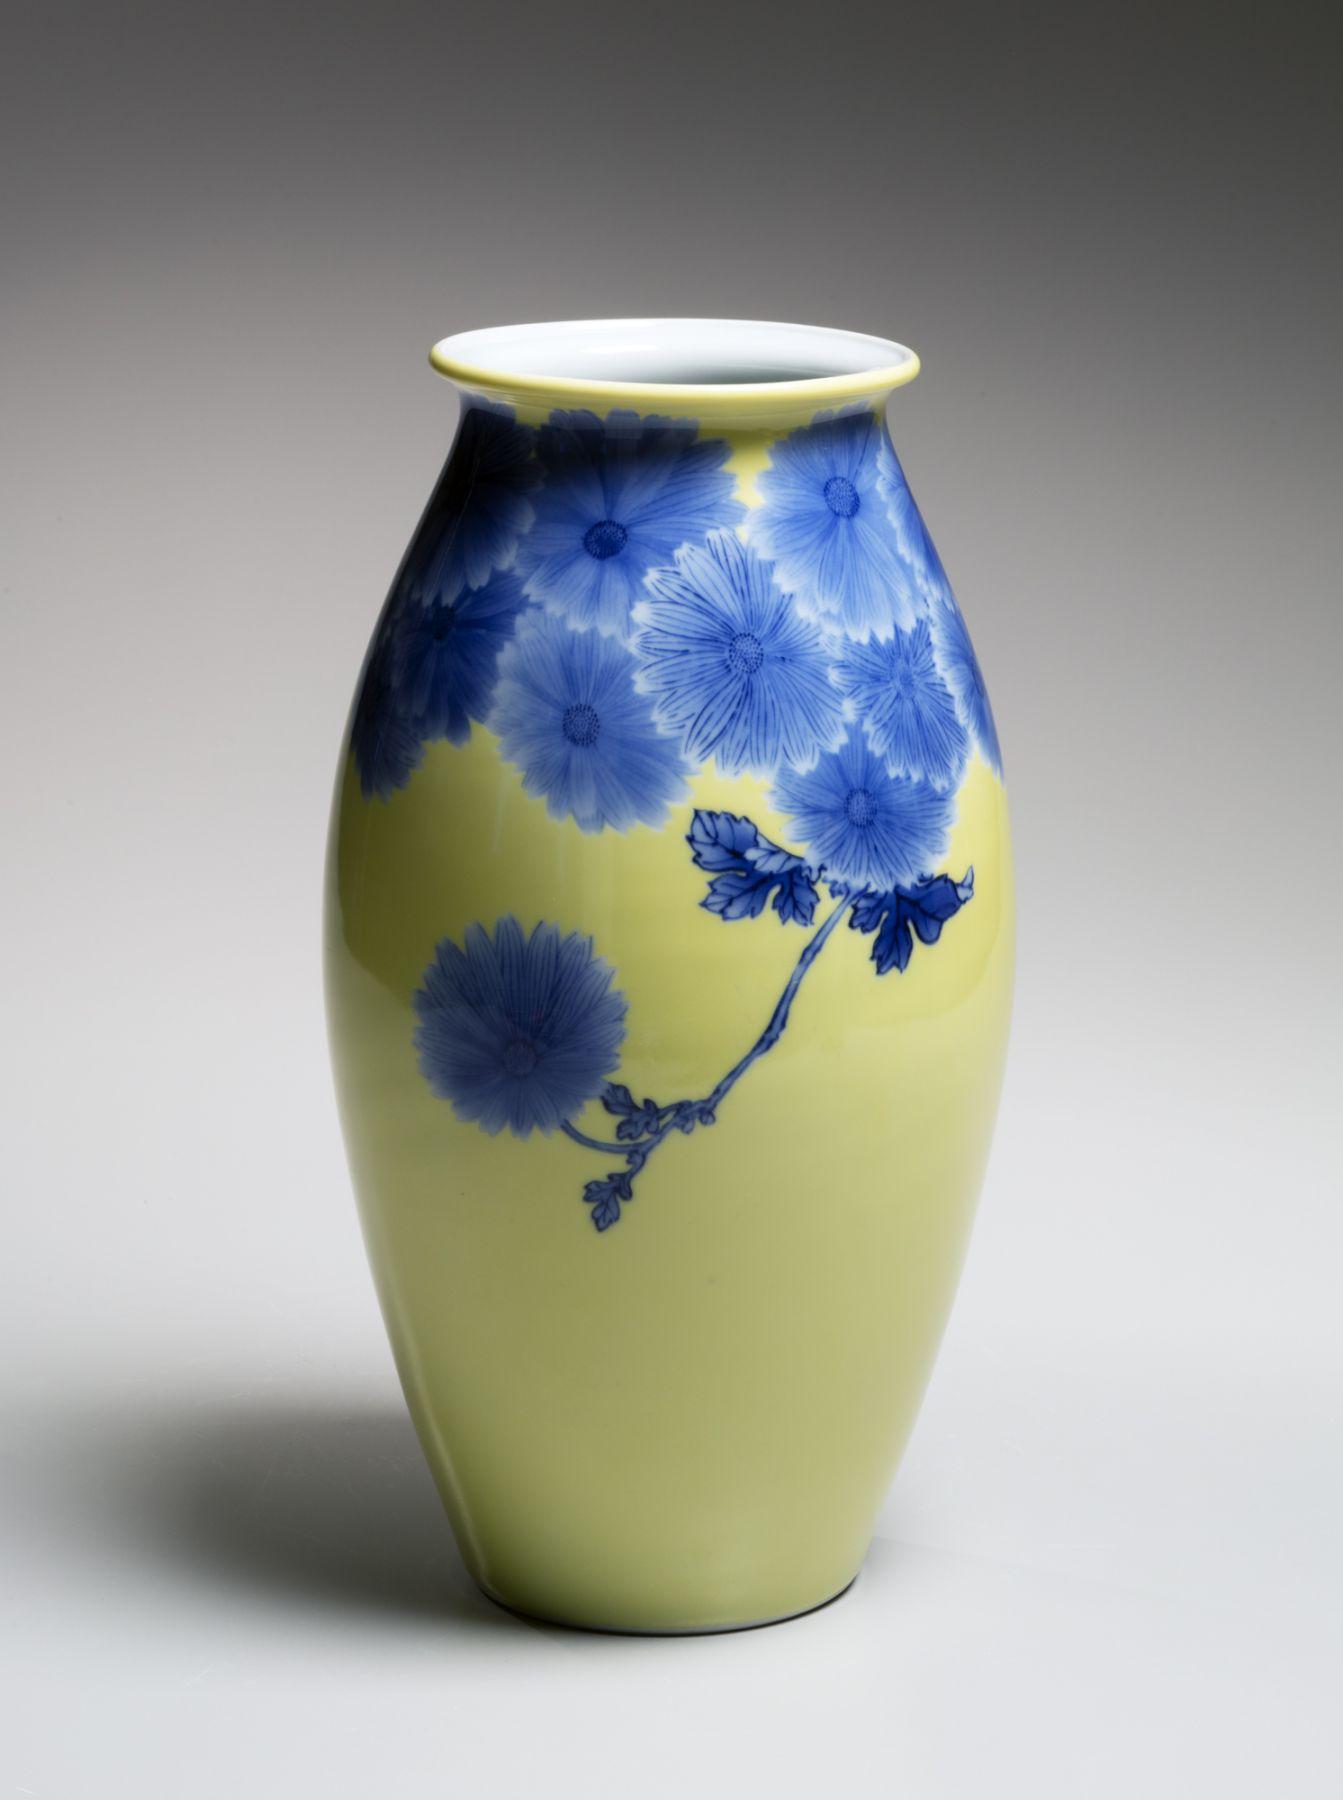 Makuzu Kōzan II (1859-1940), Yellow-glazed, blue chrysanthemum-patterned standing vase with flared mouth